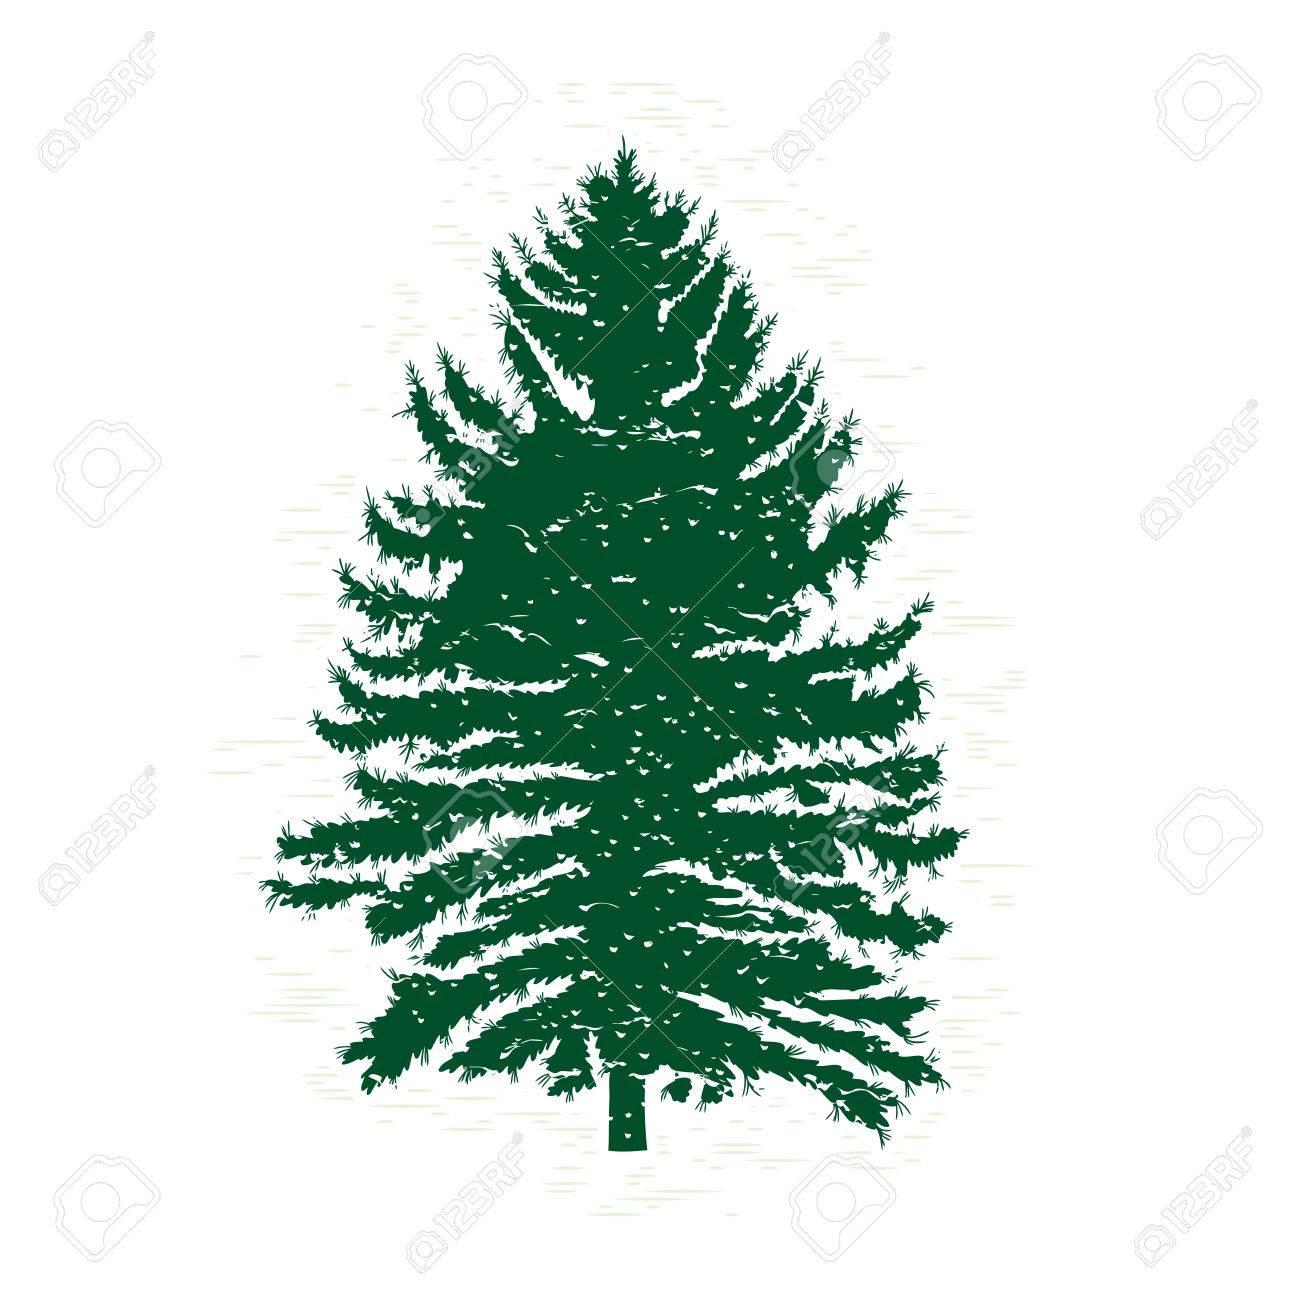 Silhouettes of green pine tree vector illustration vintage silhouettes of green pine tree vector illustration vintage textured grunge fir tree design template altavistaventures Gallery